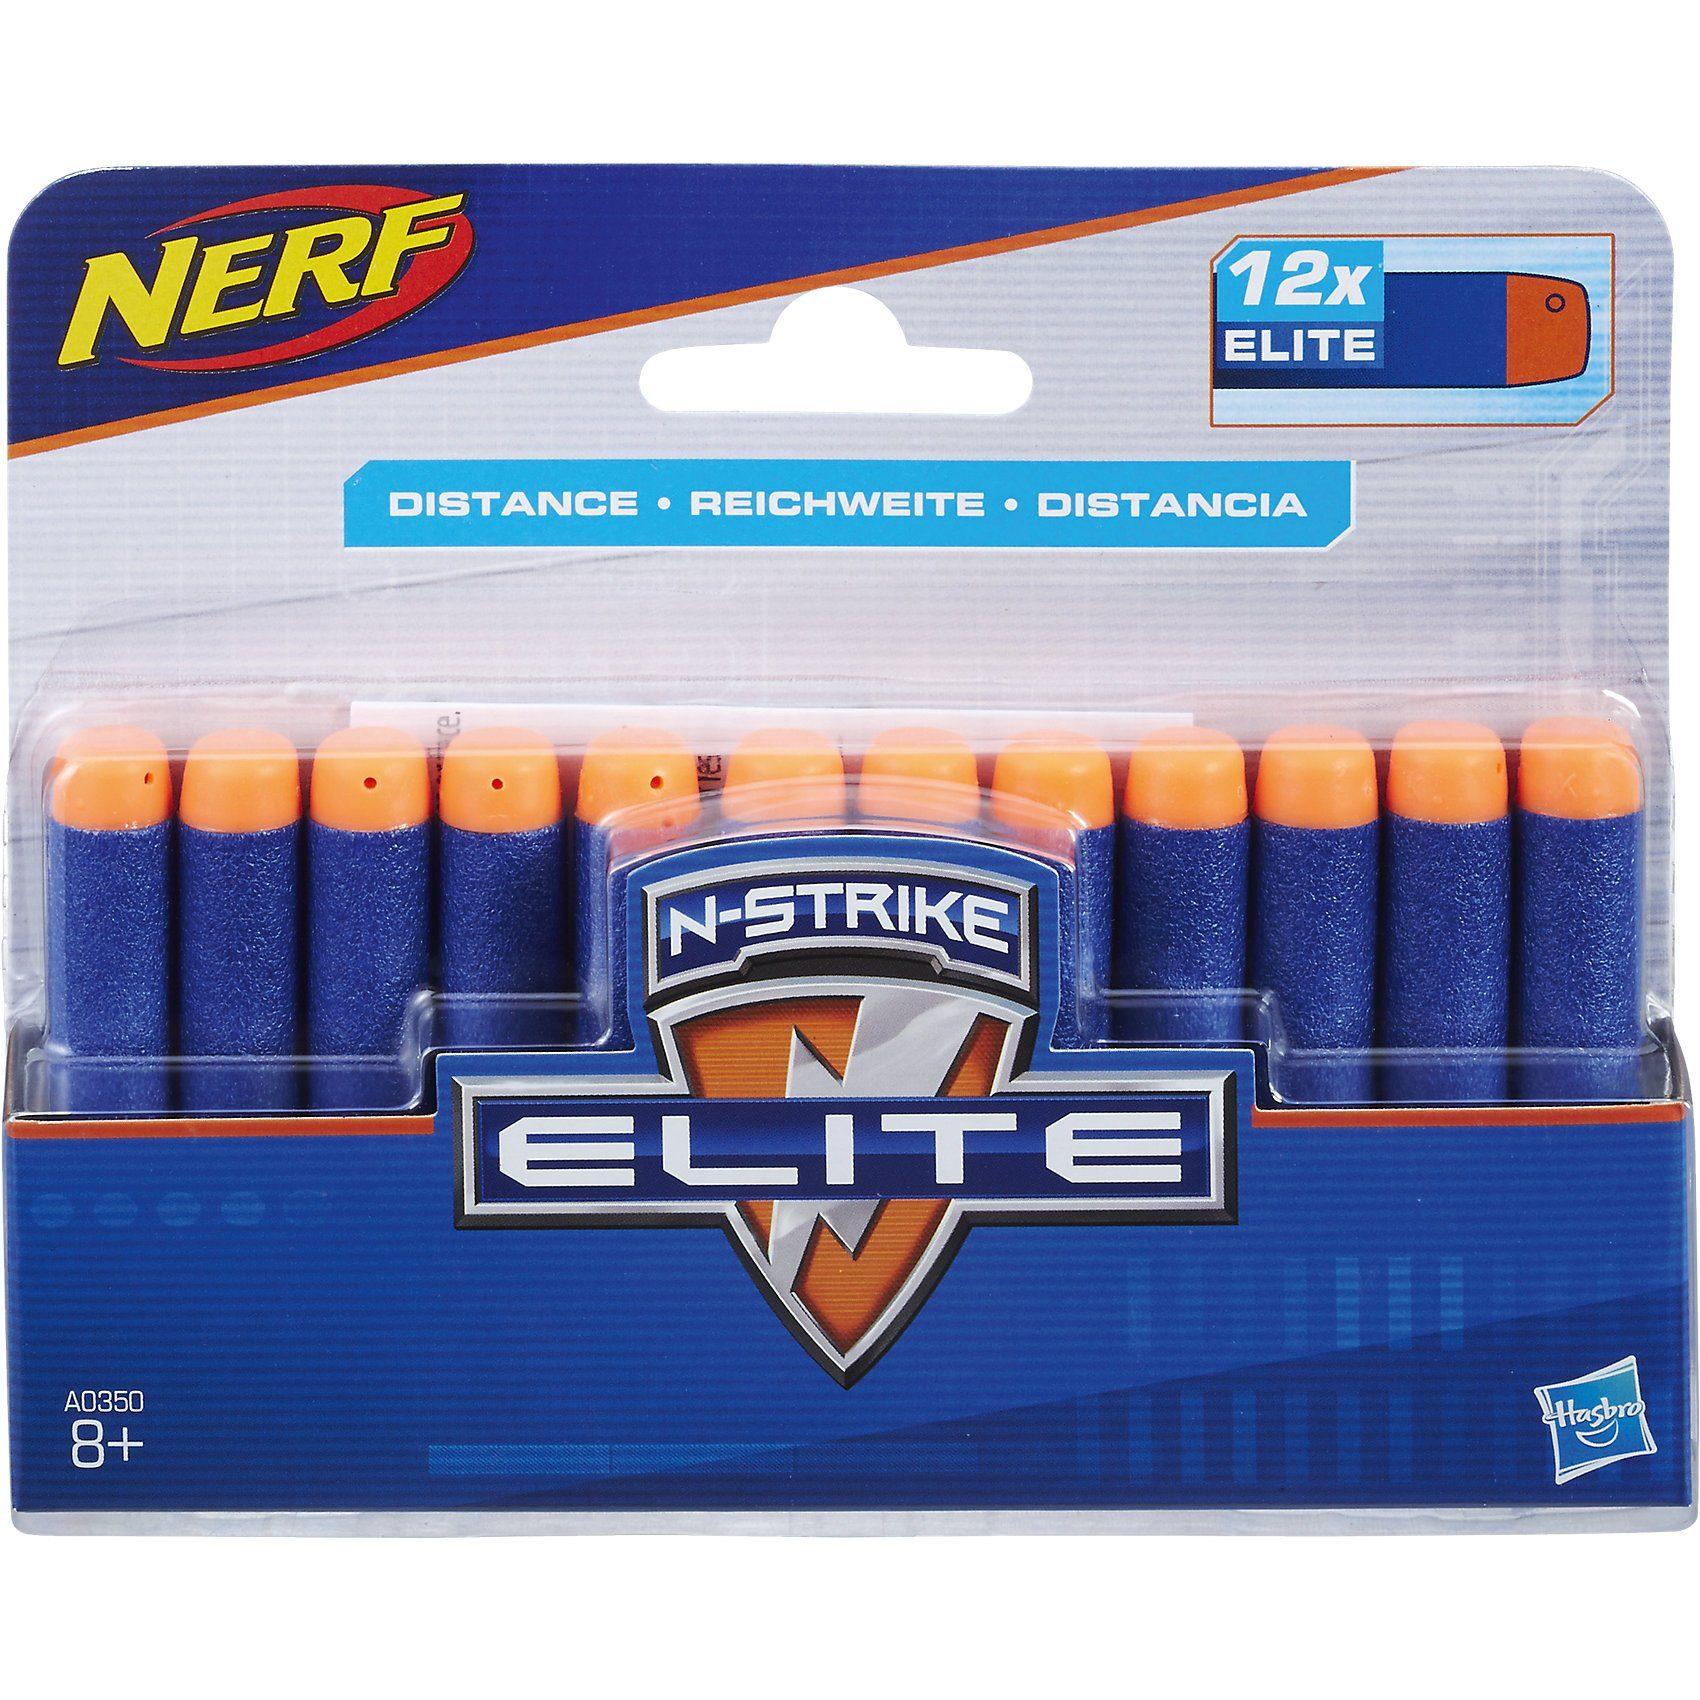 Hasbro NERF N-Strike Elite 12er Dart Nachfüllpack